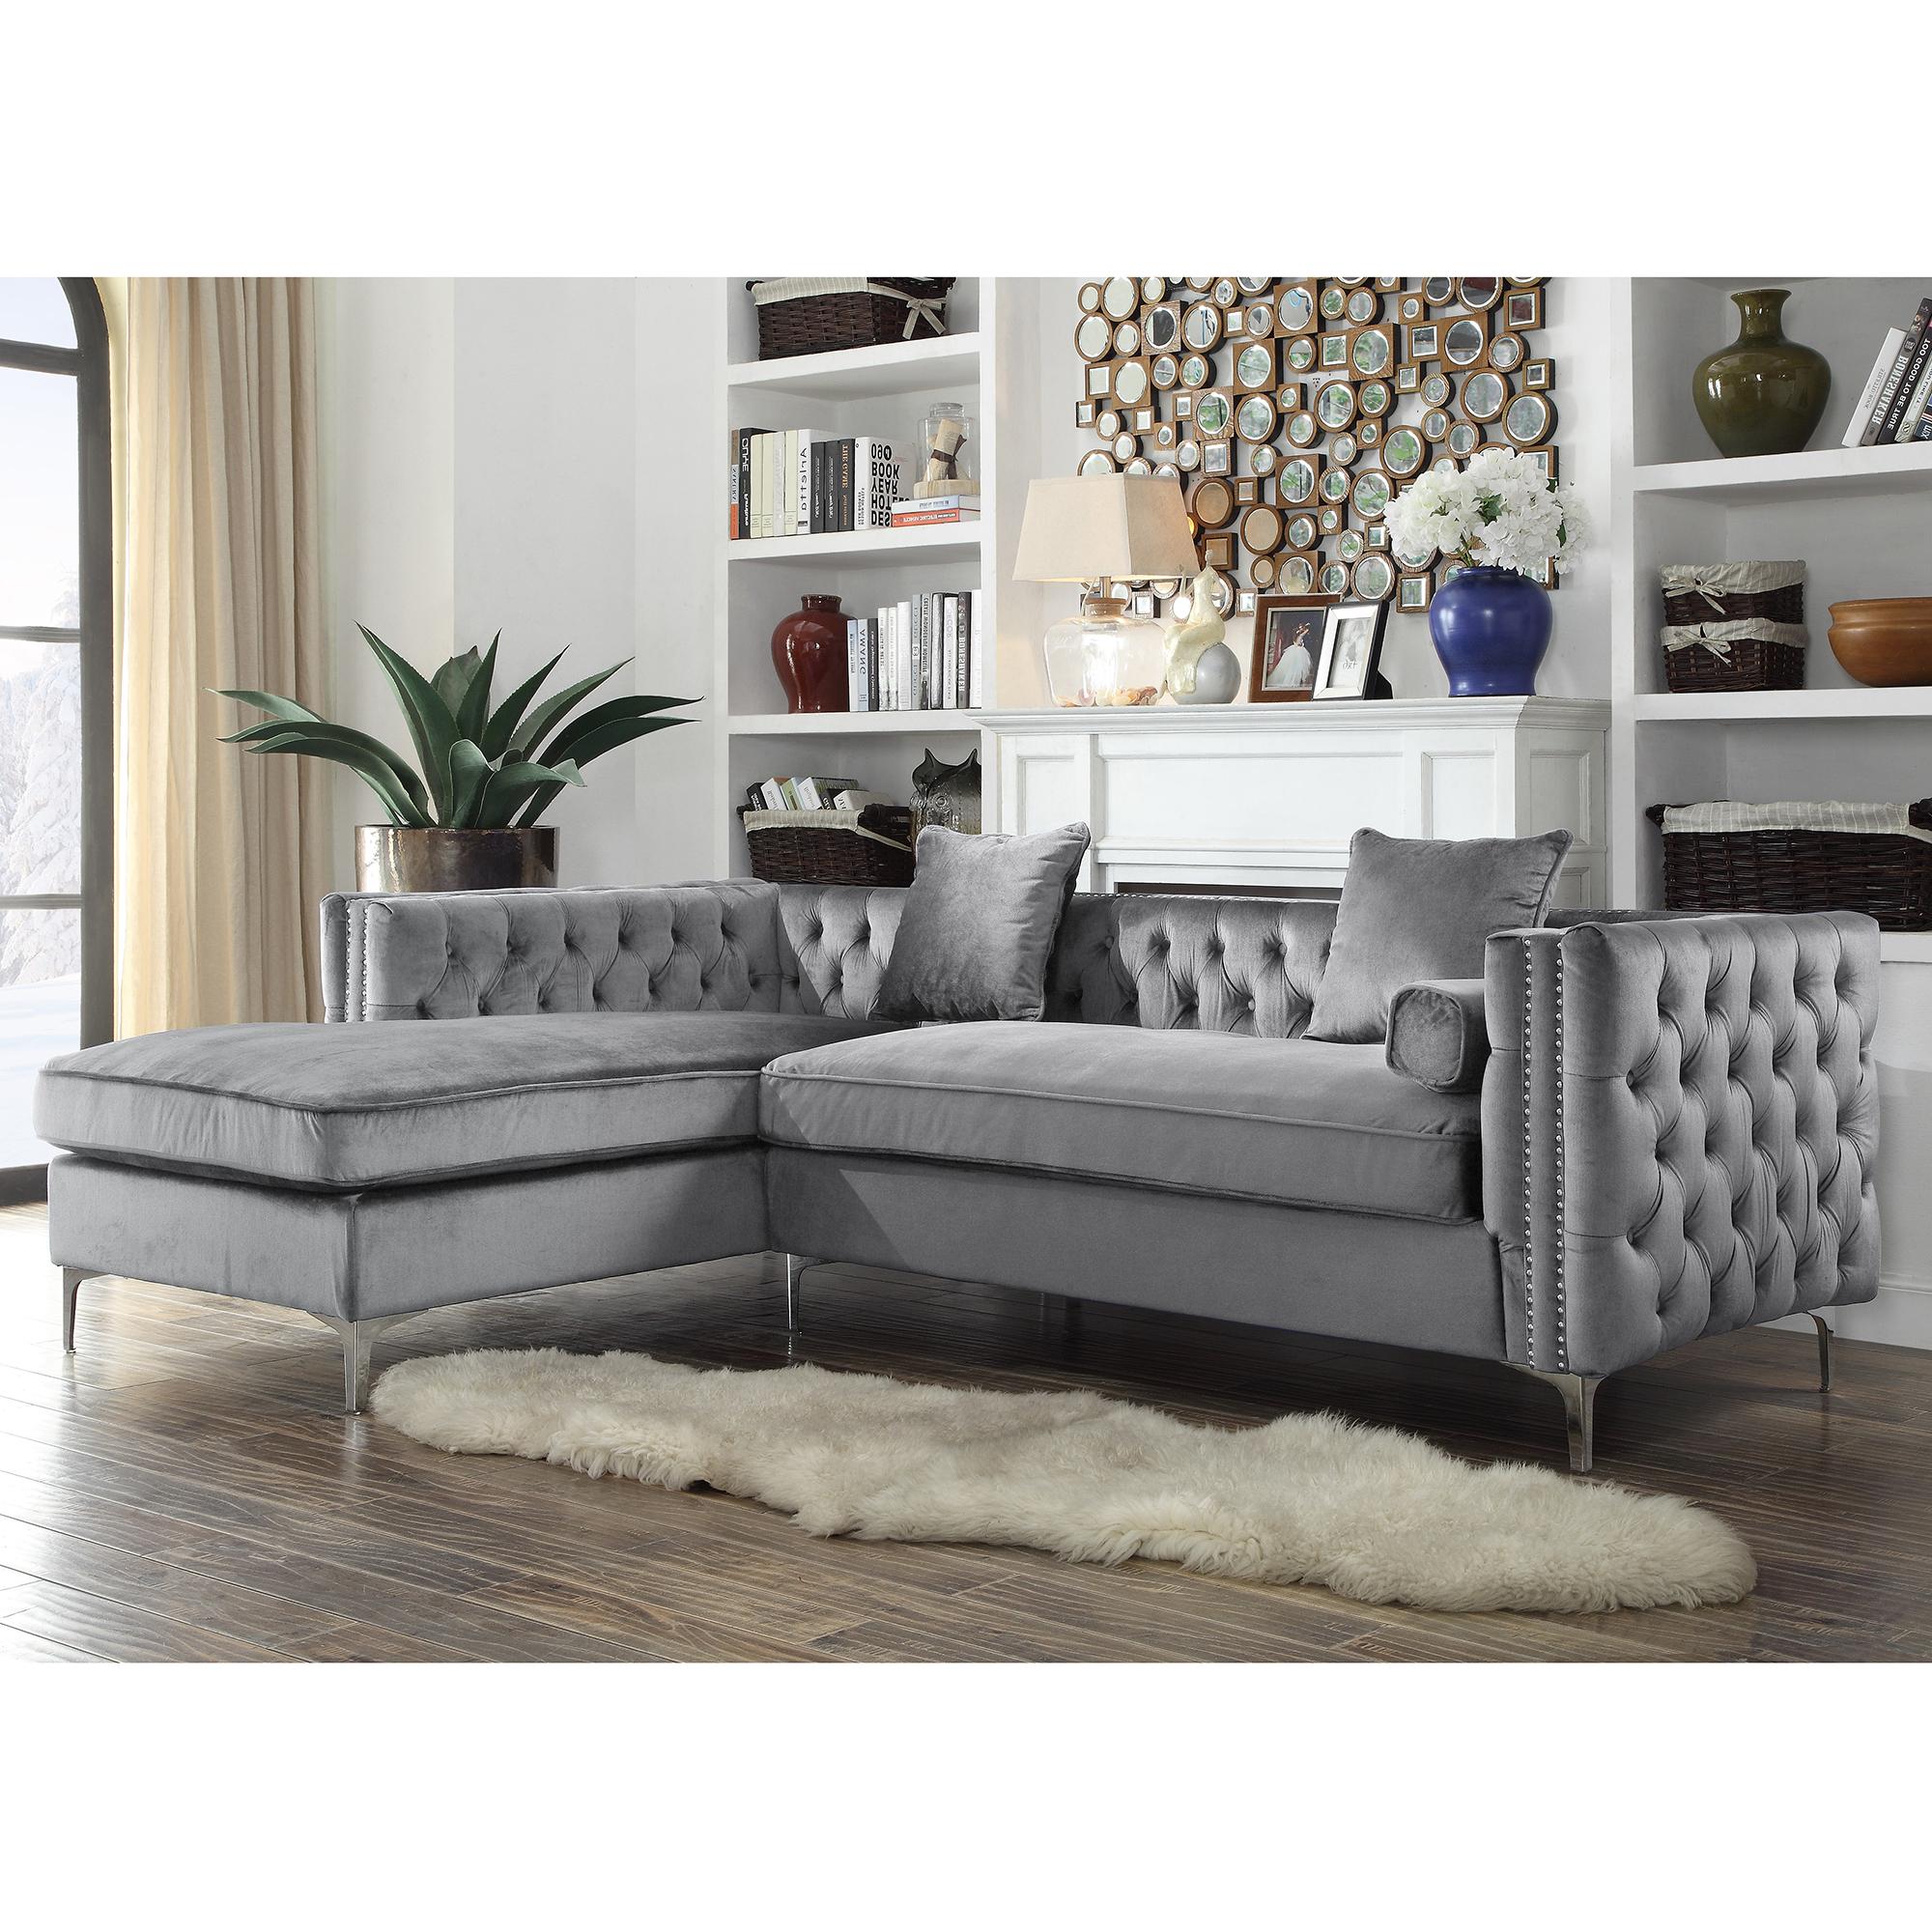 Chic Home Design Iconic Modern Furniture at Dynamic Home Decor Home Design Sofa W Orange Html on facebook orange, twitter orange, word orange, jpeg orange, ajax orange, microsoft orange,